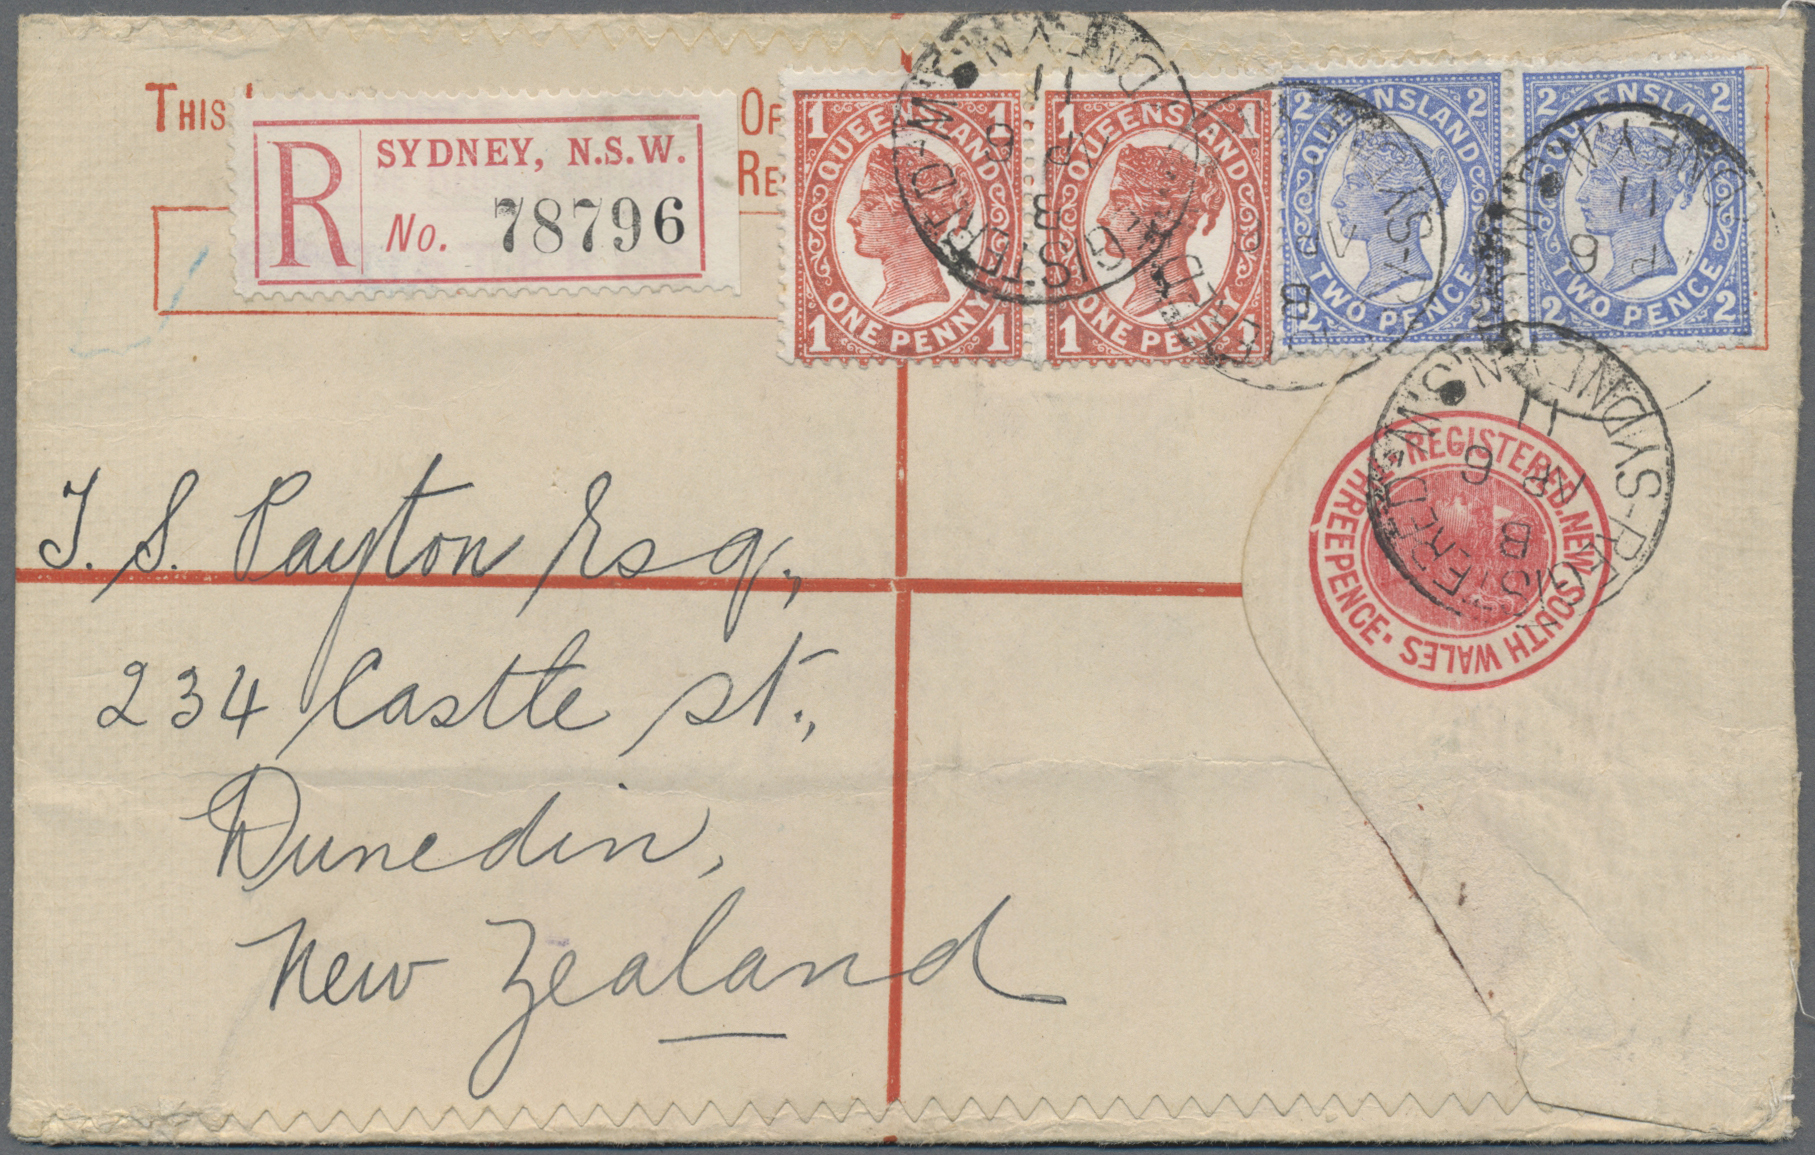 Lot 16063 - Australische Staaten | Australian States  -  Auktionshaus Christoph Gärtner GmbH & Co. KG 50th Auction Anniversary Auction - Day 5